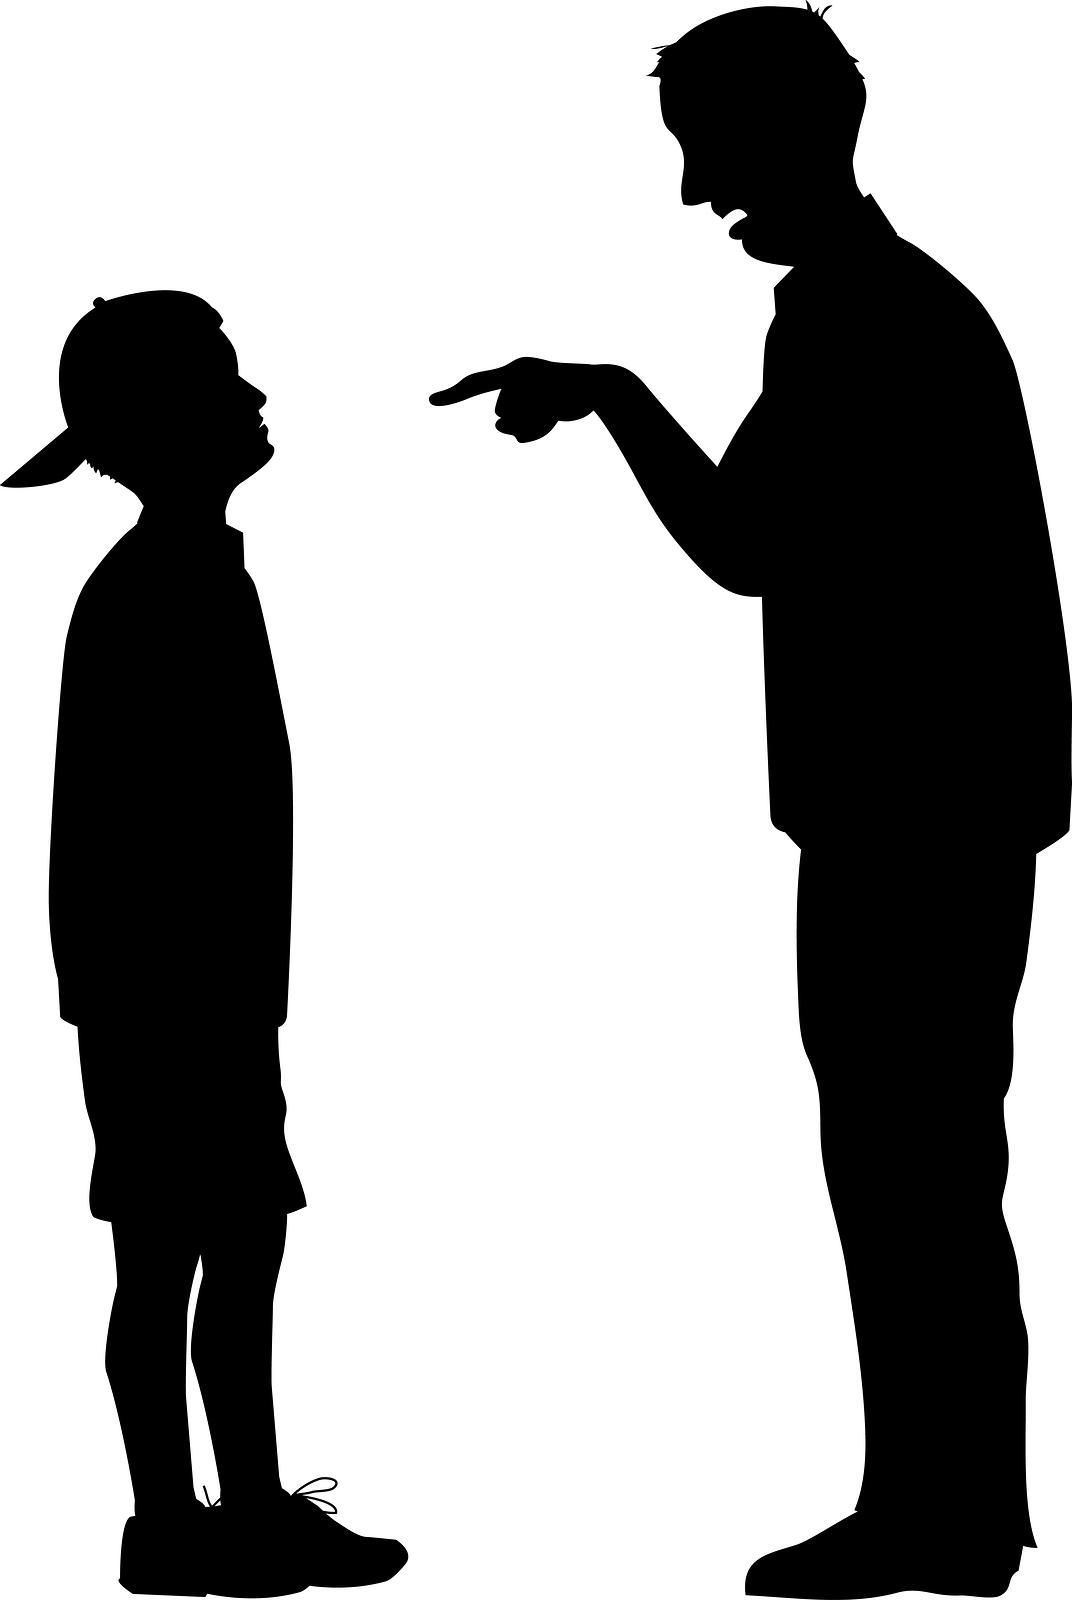 Black father tten son clipart graphic free Father And Teenage Son Clipart graphic free